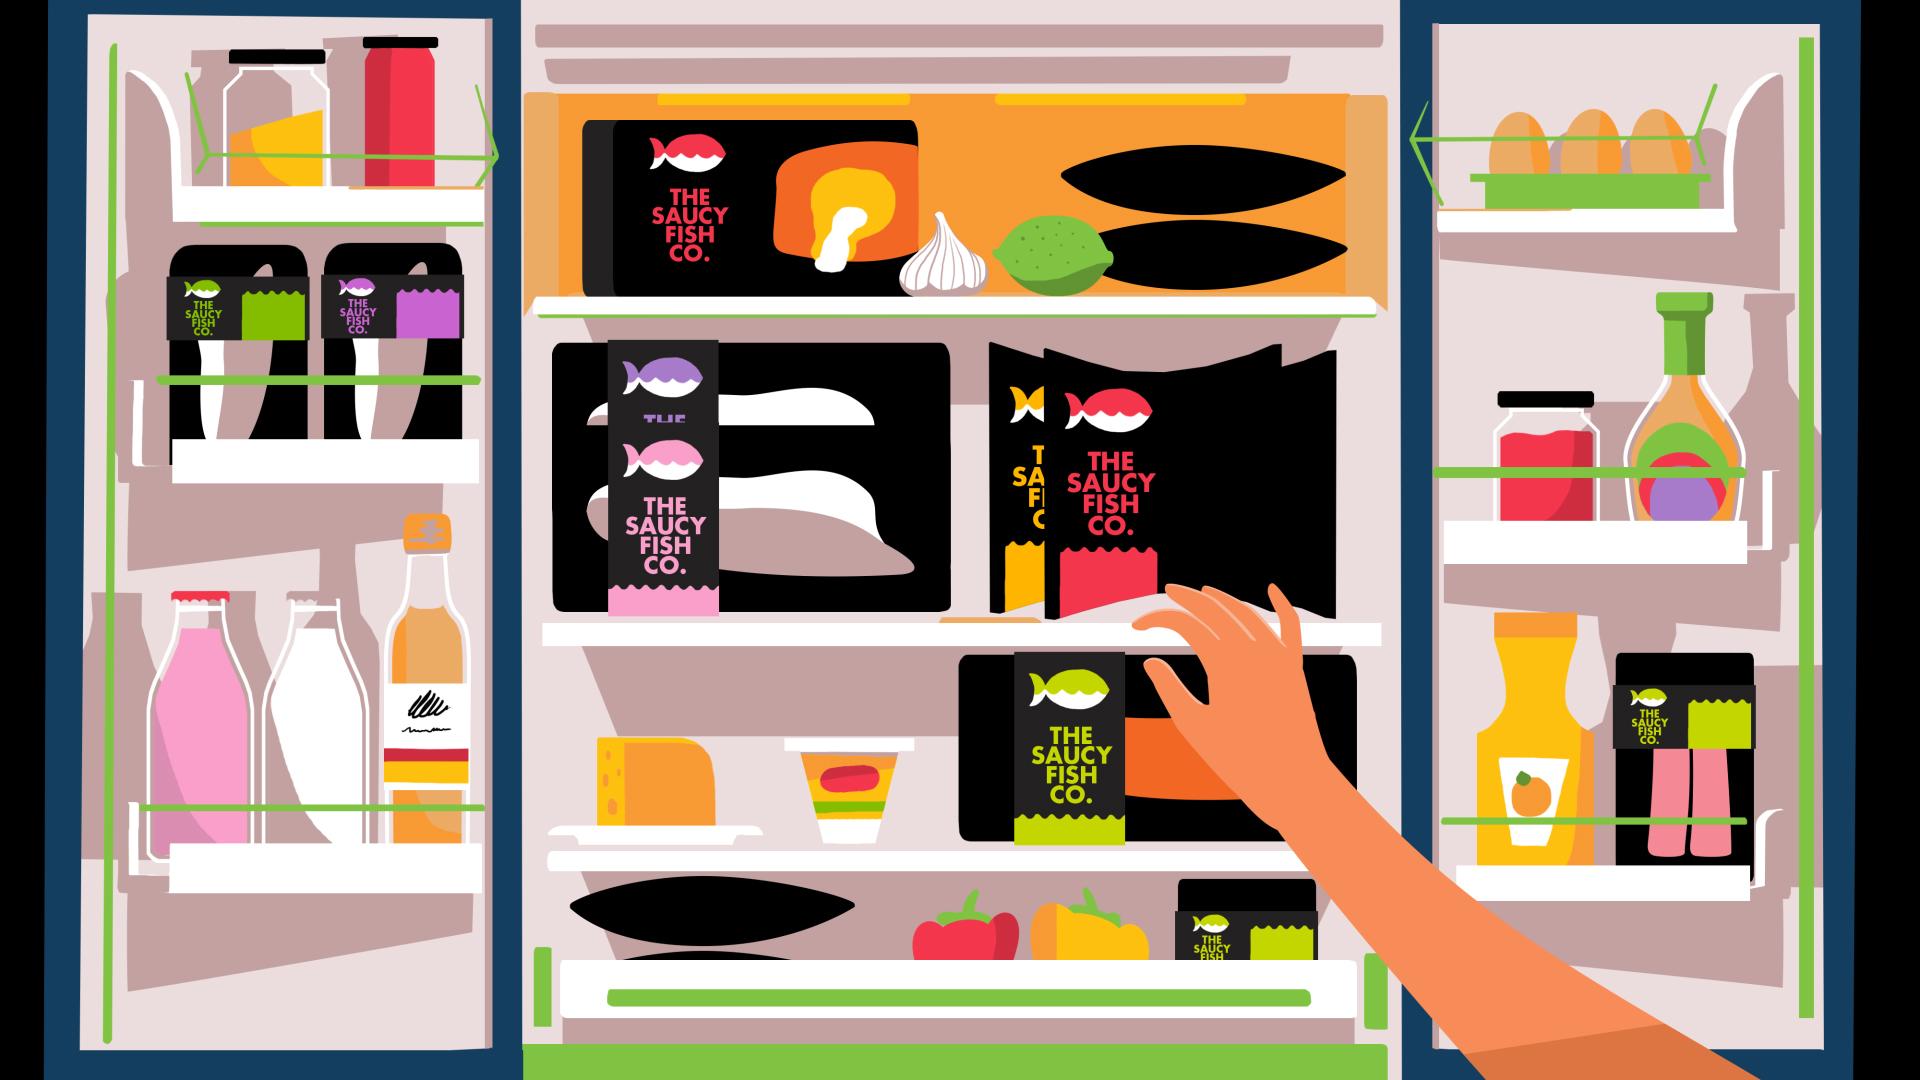 coolbrands16-image5-fridge.jpg